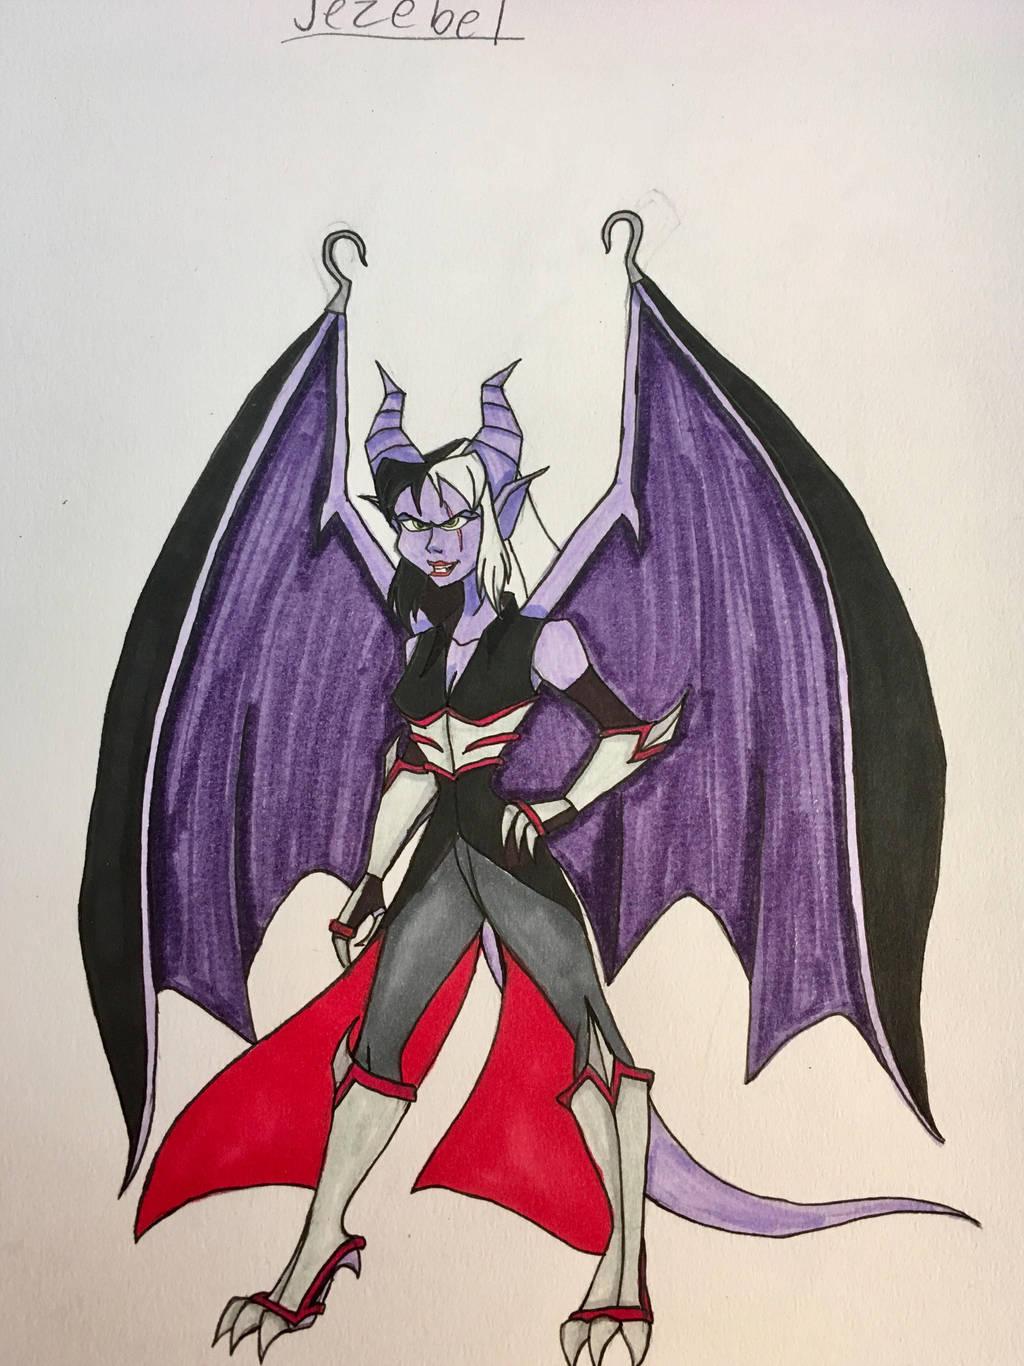 Disney/Gargoyles OC: Jezebel by EmilyDfan